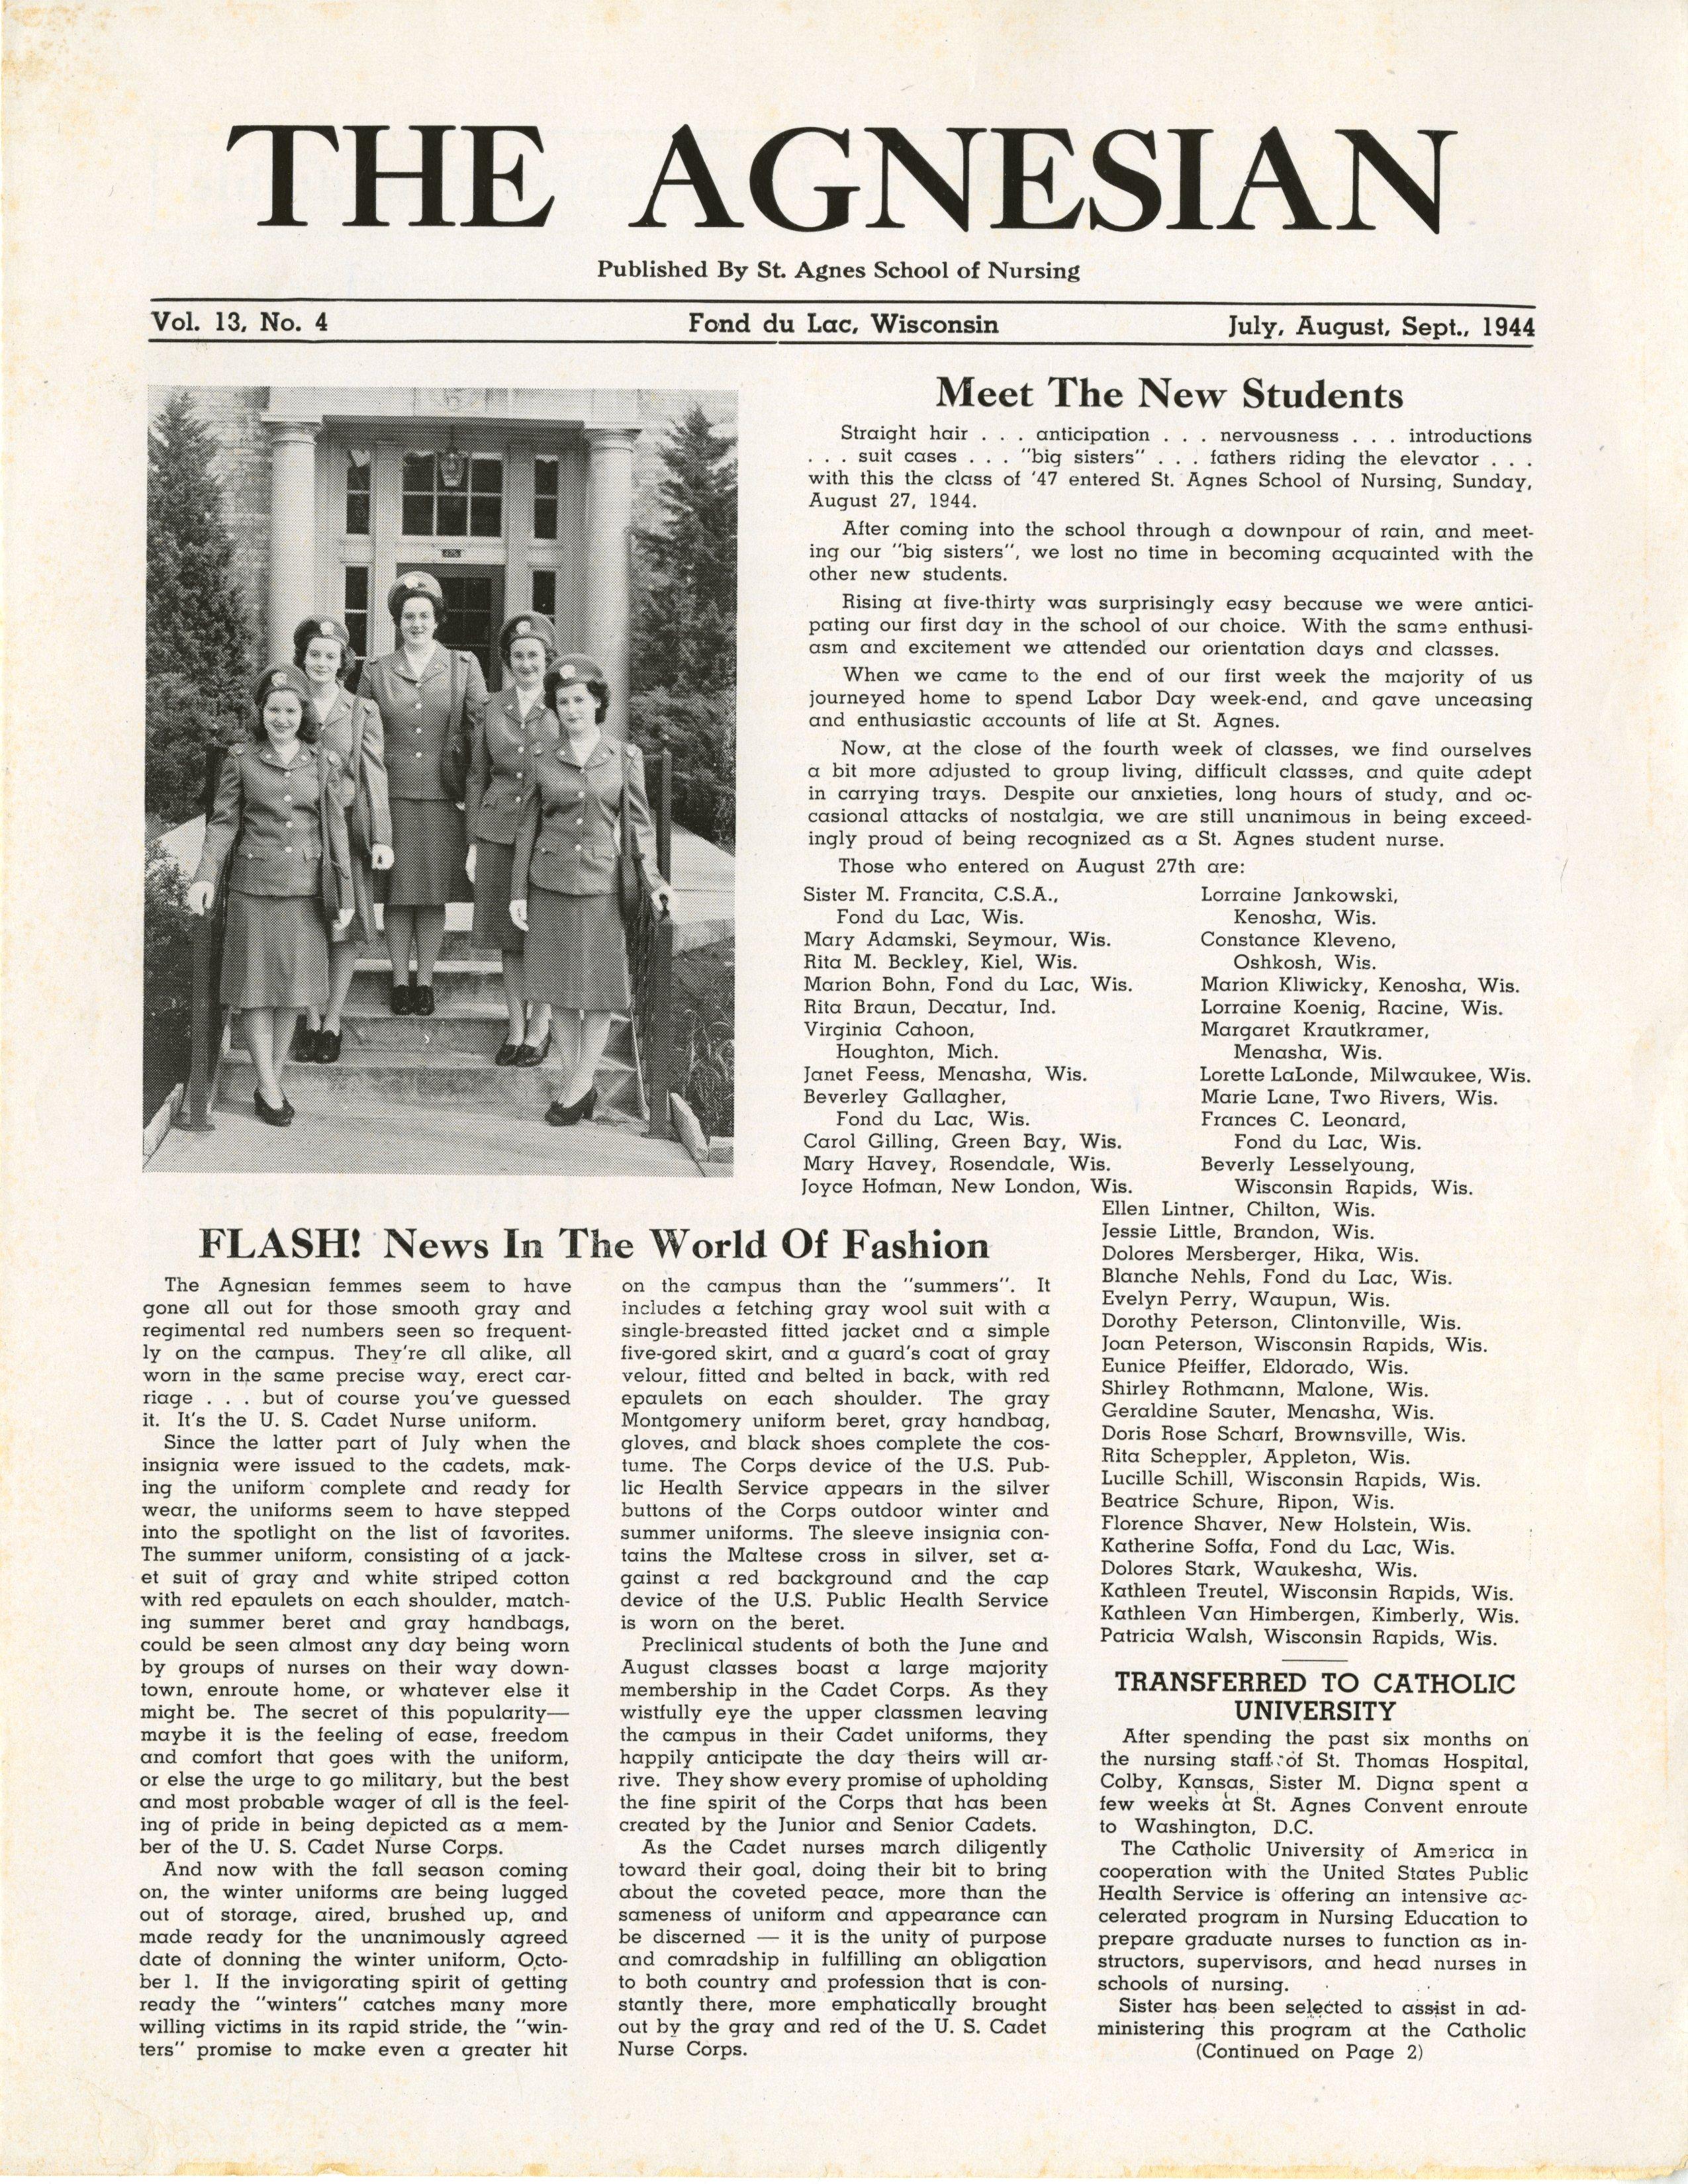 1944 The Agnesian